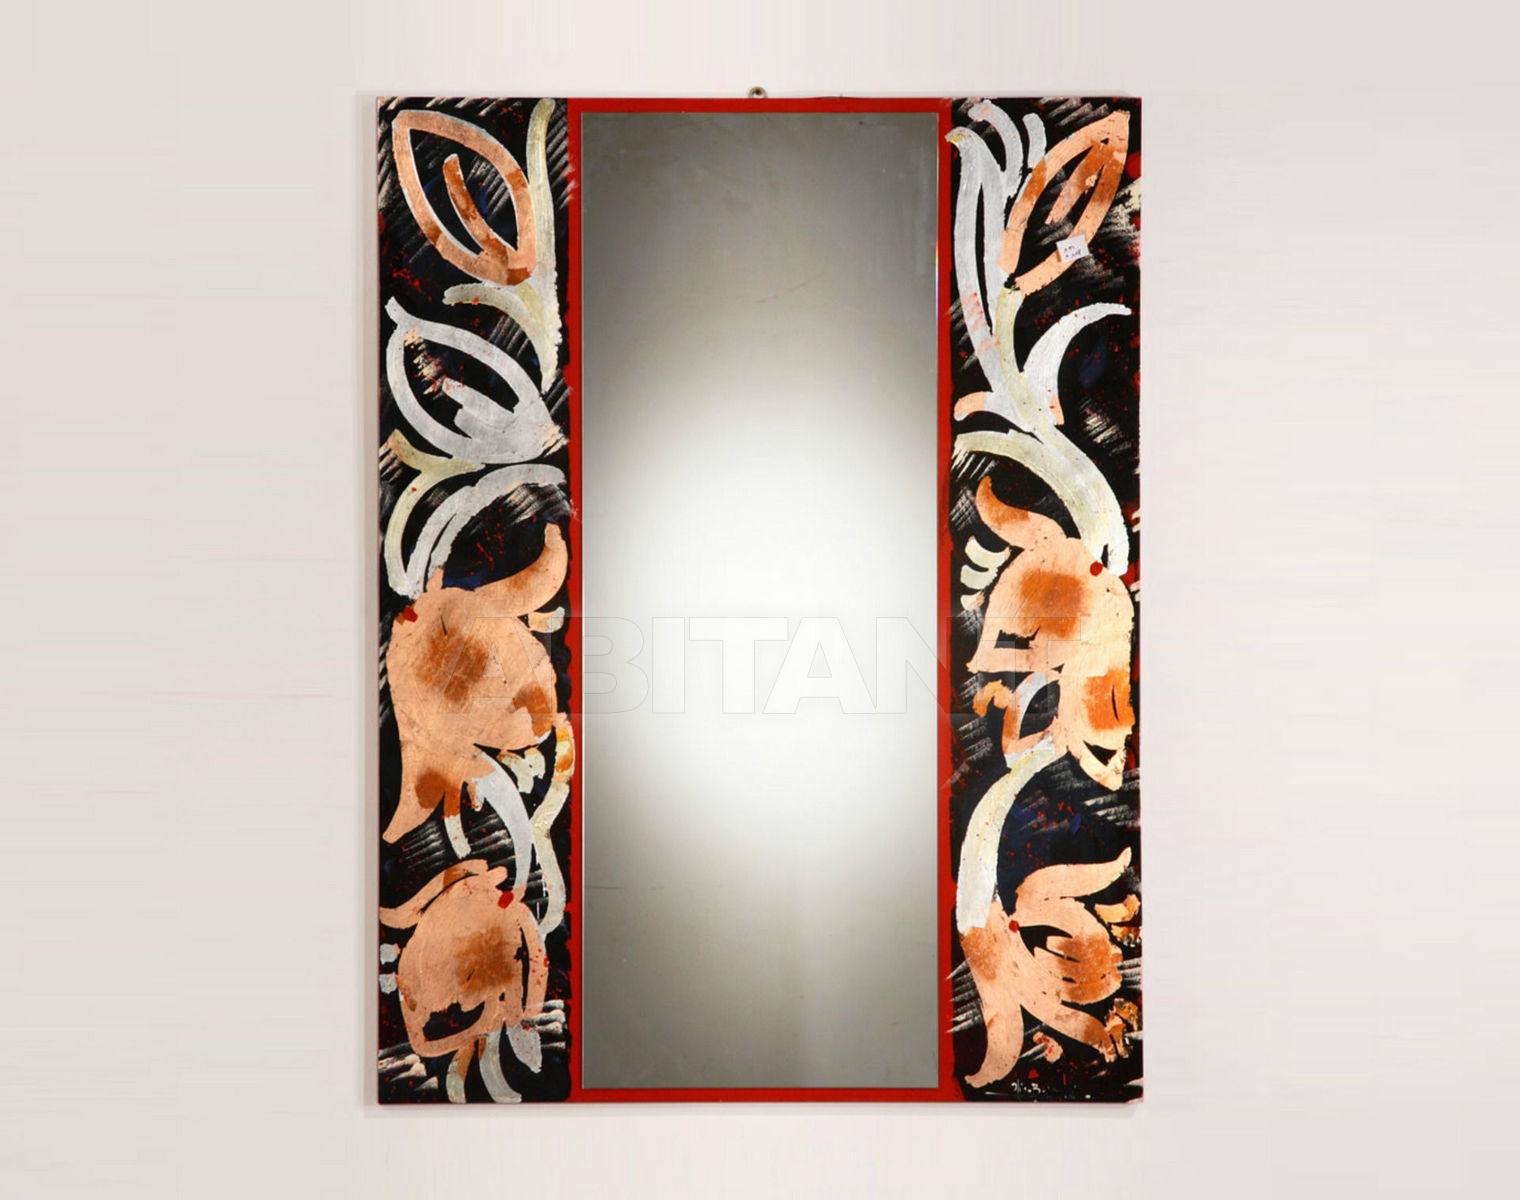 Купить Зеркало настенное Swirly RM Arredamenti - Capricio Capricio A126.F205.39